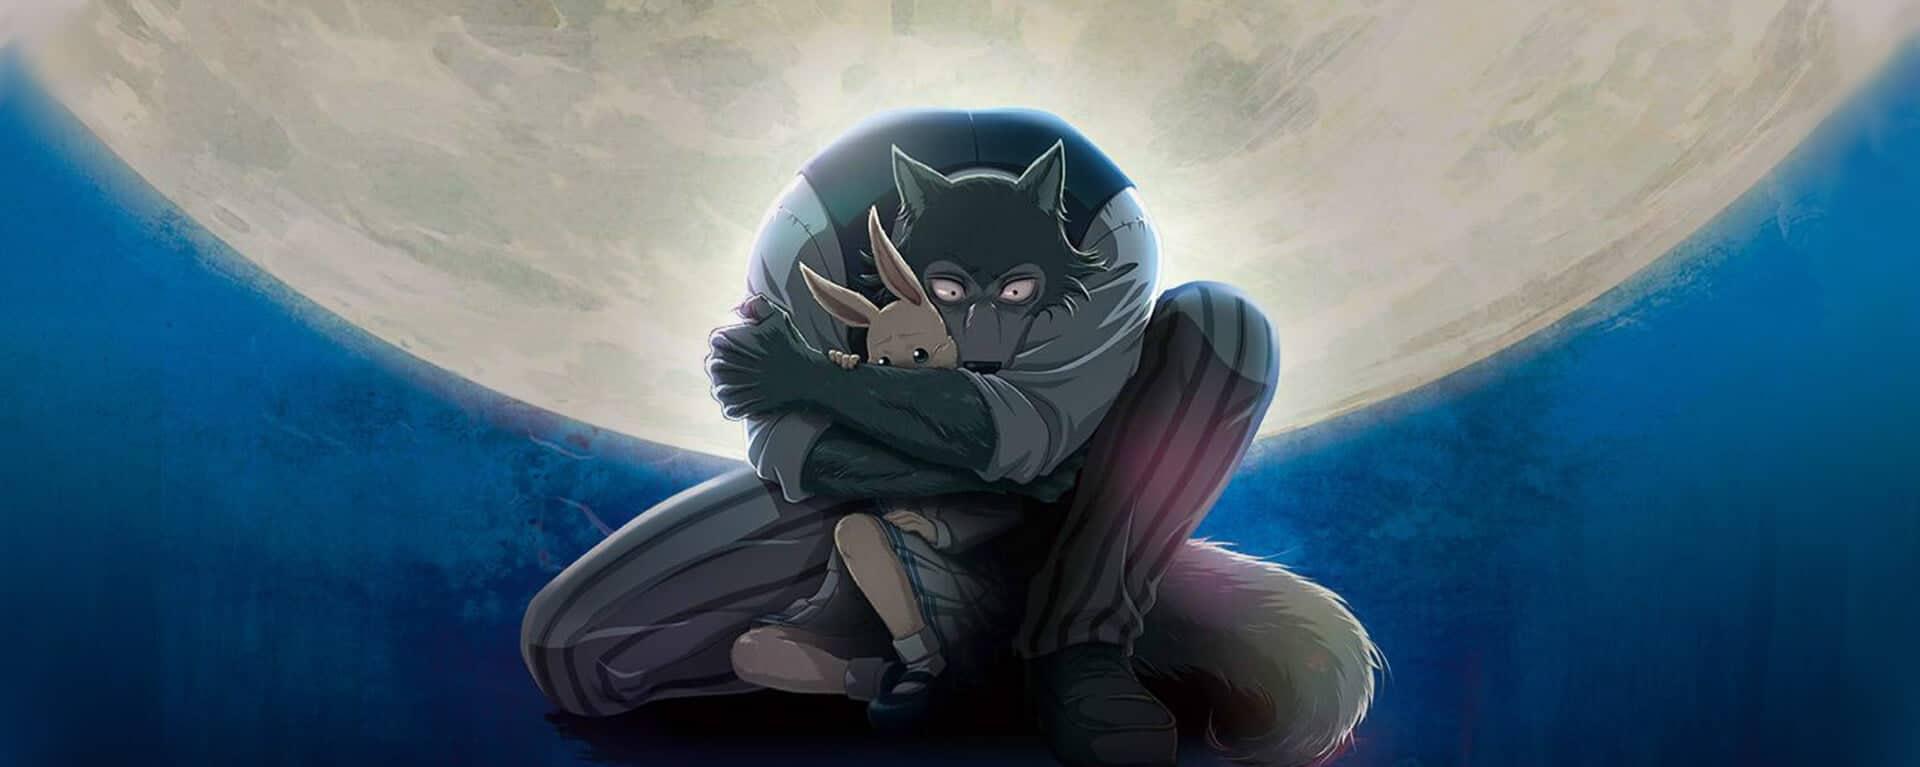 Legosh o lobo atacando a coelha Haru